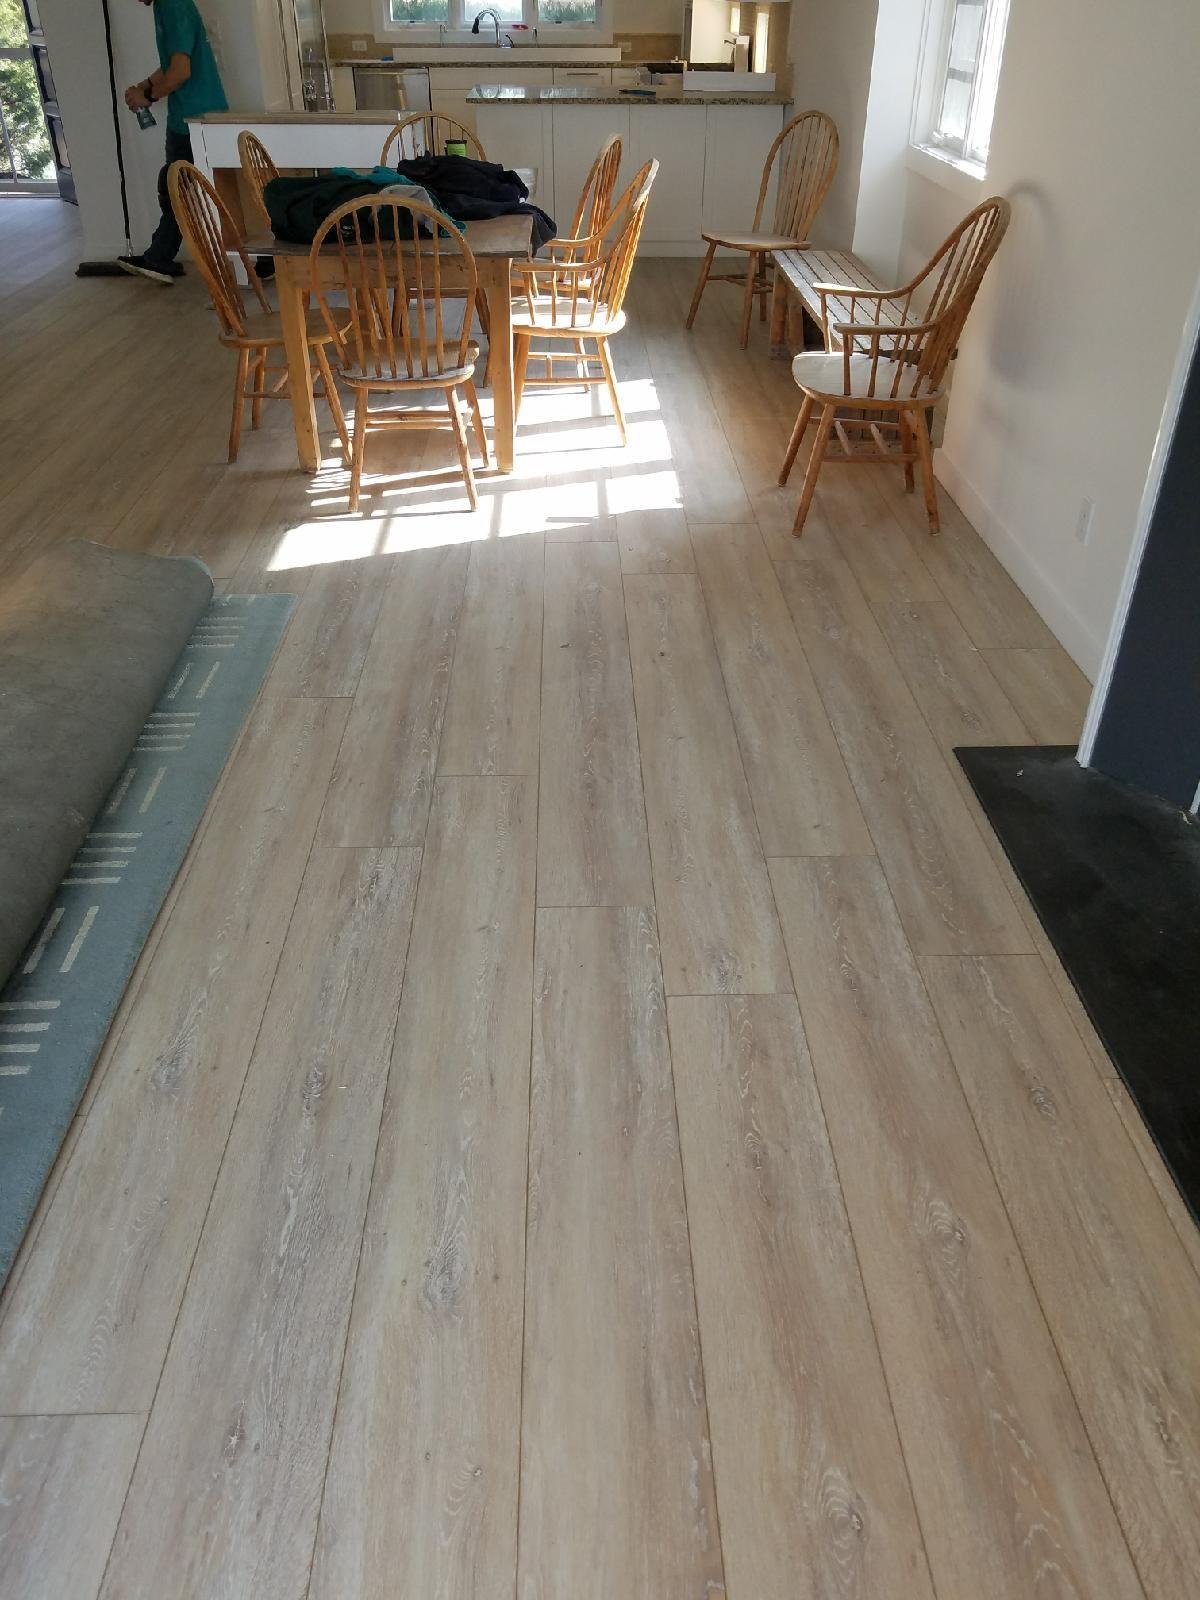 CoreTec Plus LVP Flooring, Home decor, Hardwood floors